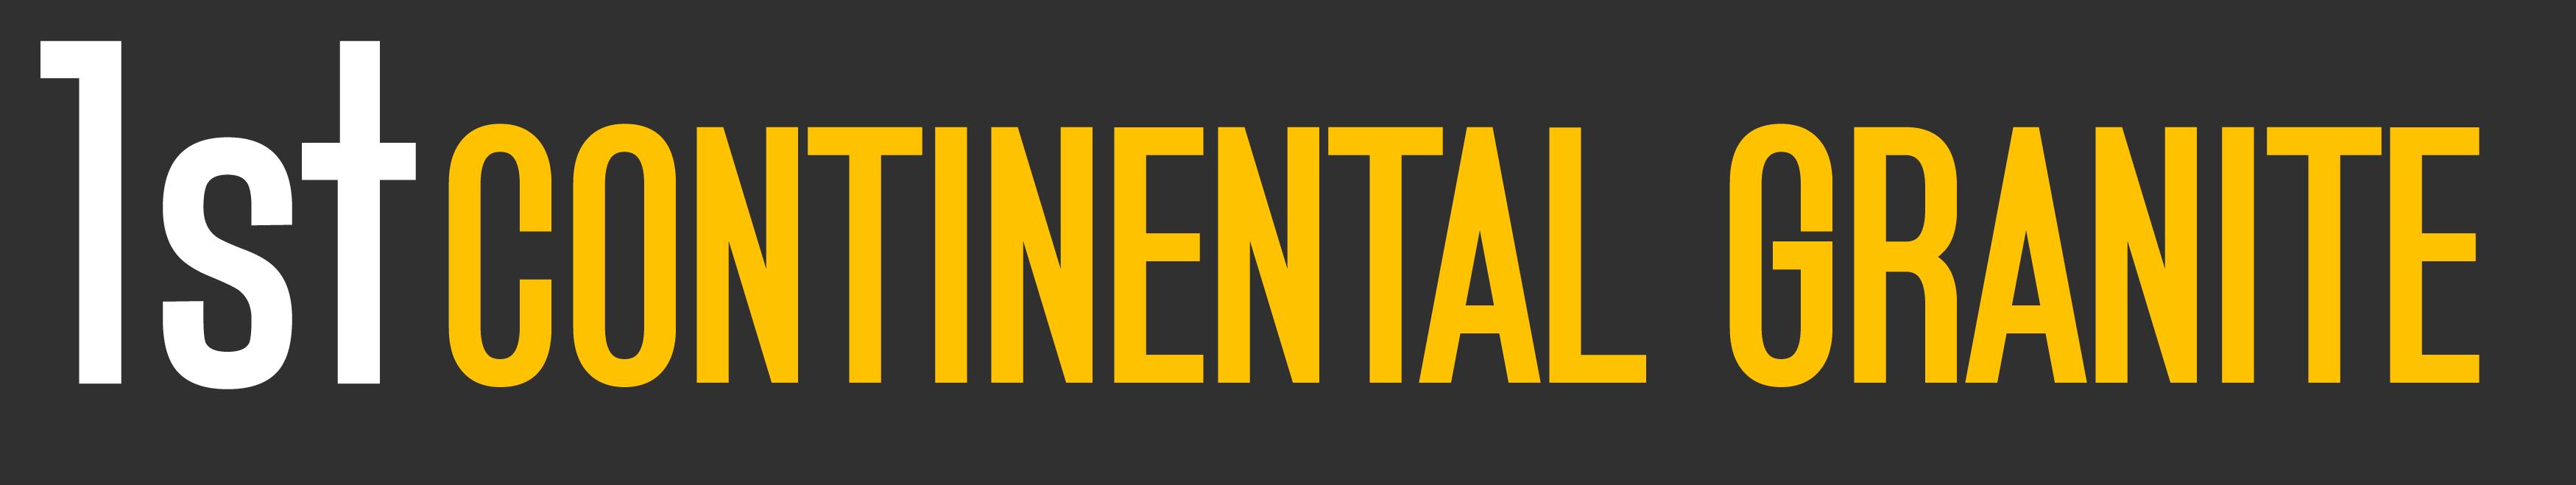 logo-1cg